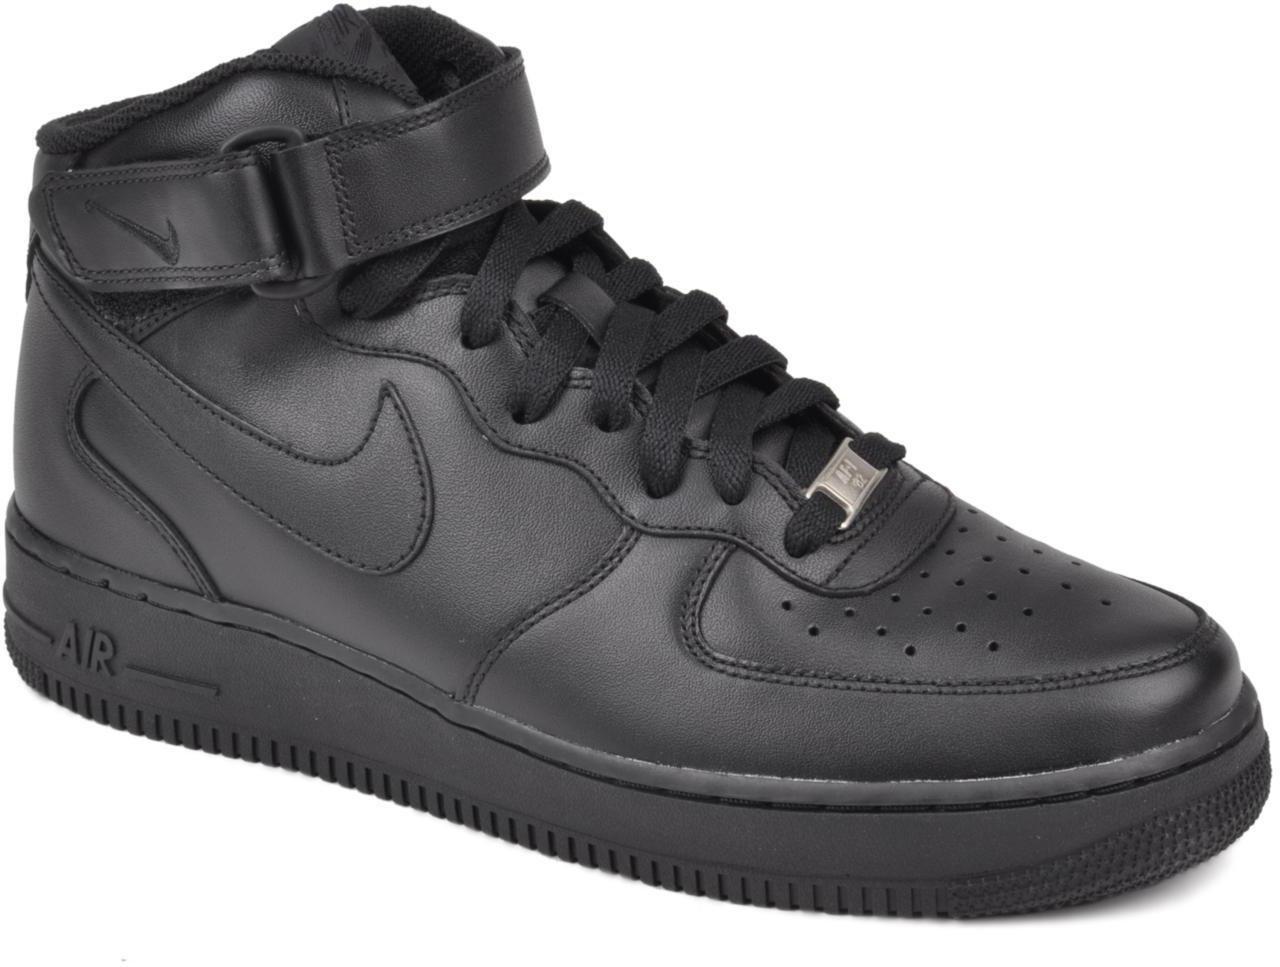 competitive price 7a253 45ec9 Nike Air Force 1 Mid ab 52,99 € günstig im Preisvergleich kaufen